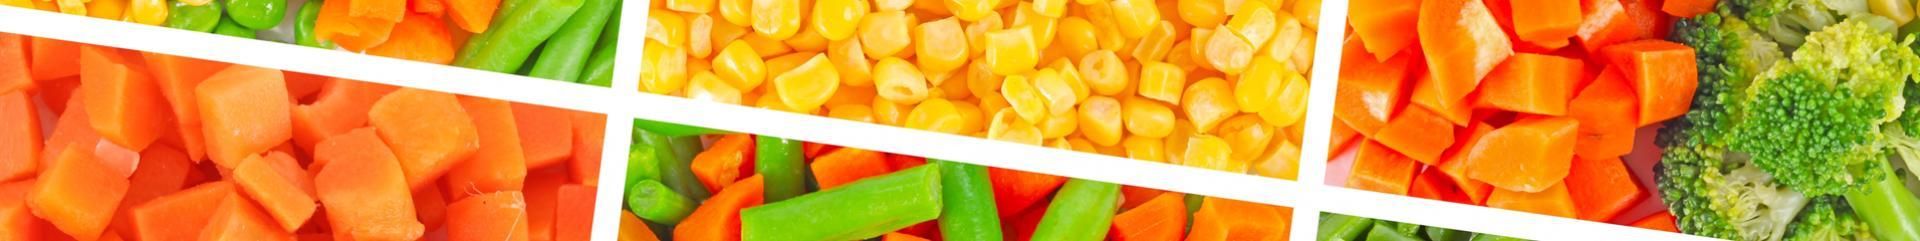 verduras, Verduras